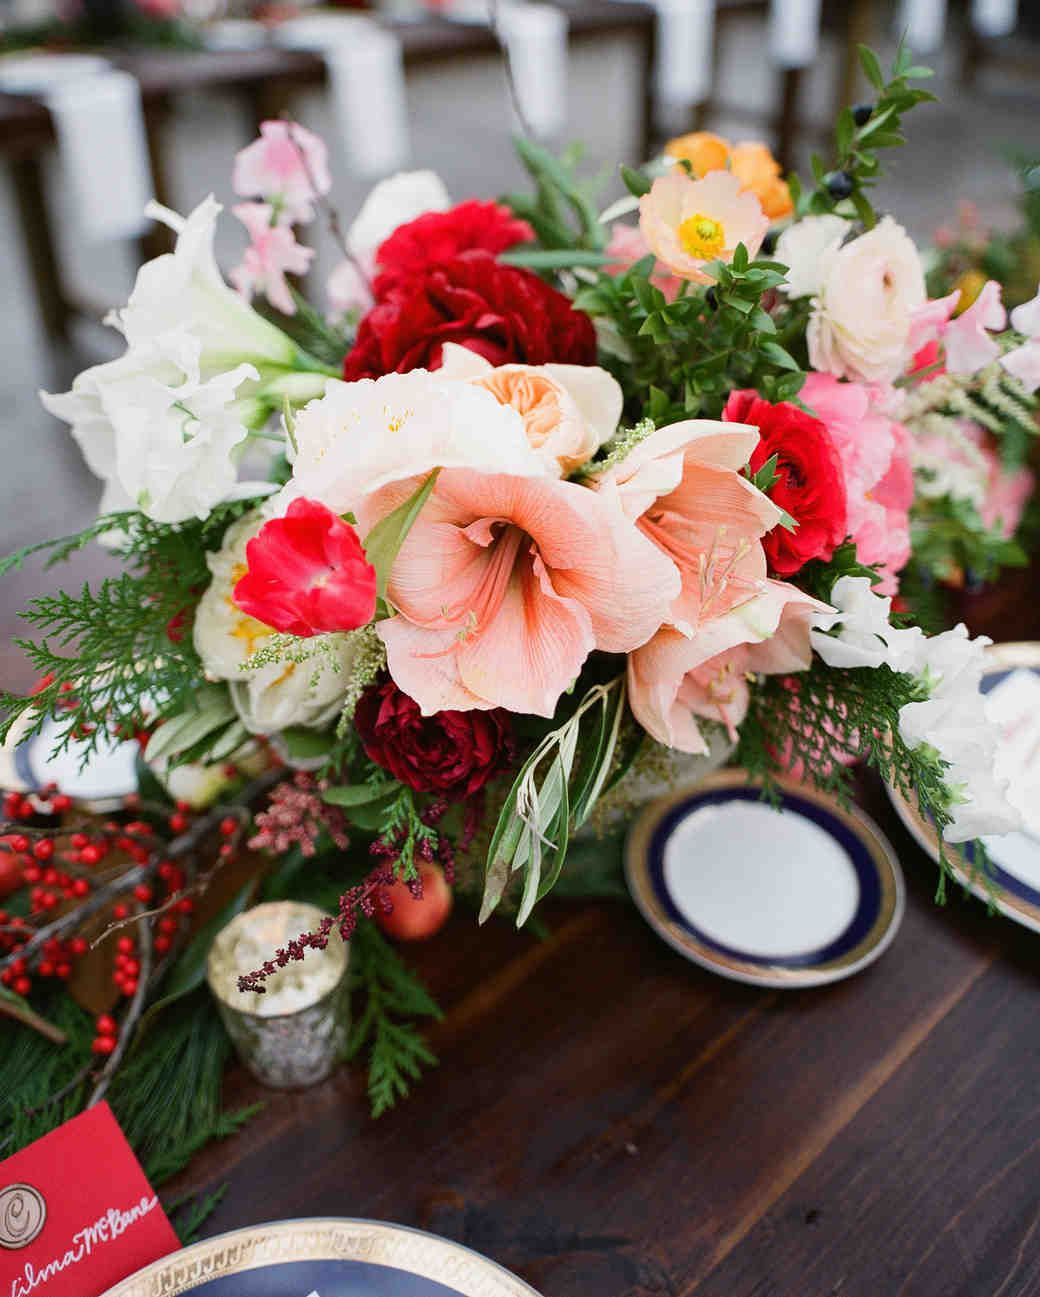 50 Wedding Centerpiece Ideas We Love Wedding Ideas Pinterest